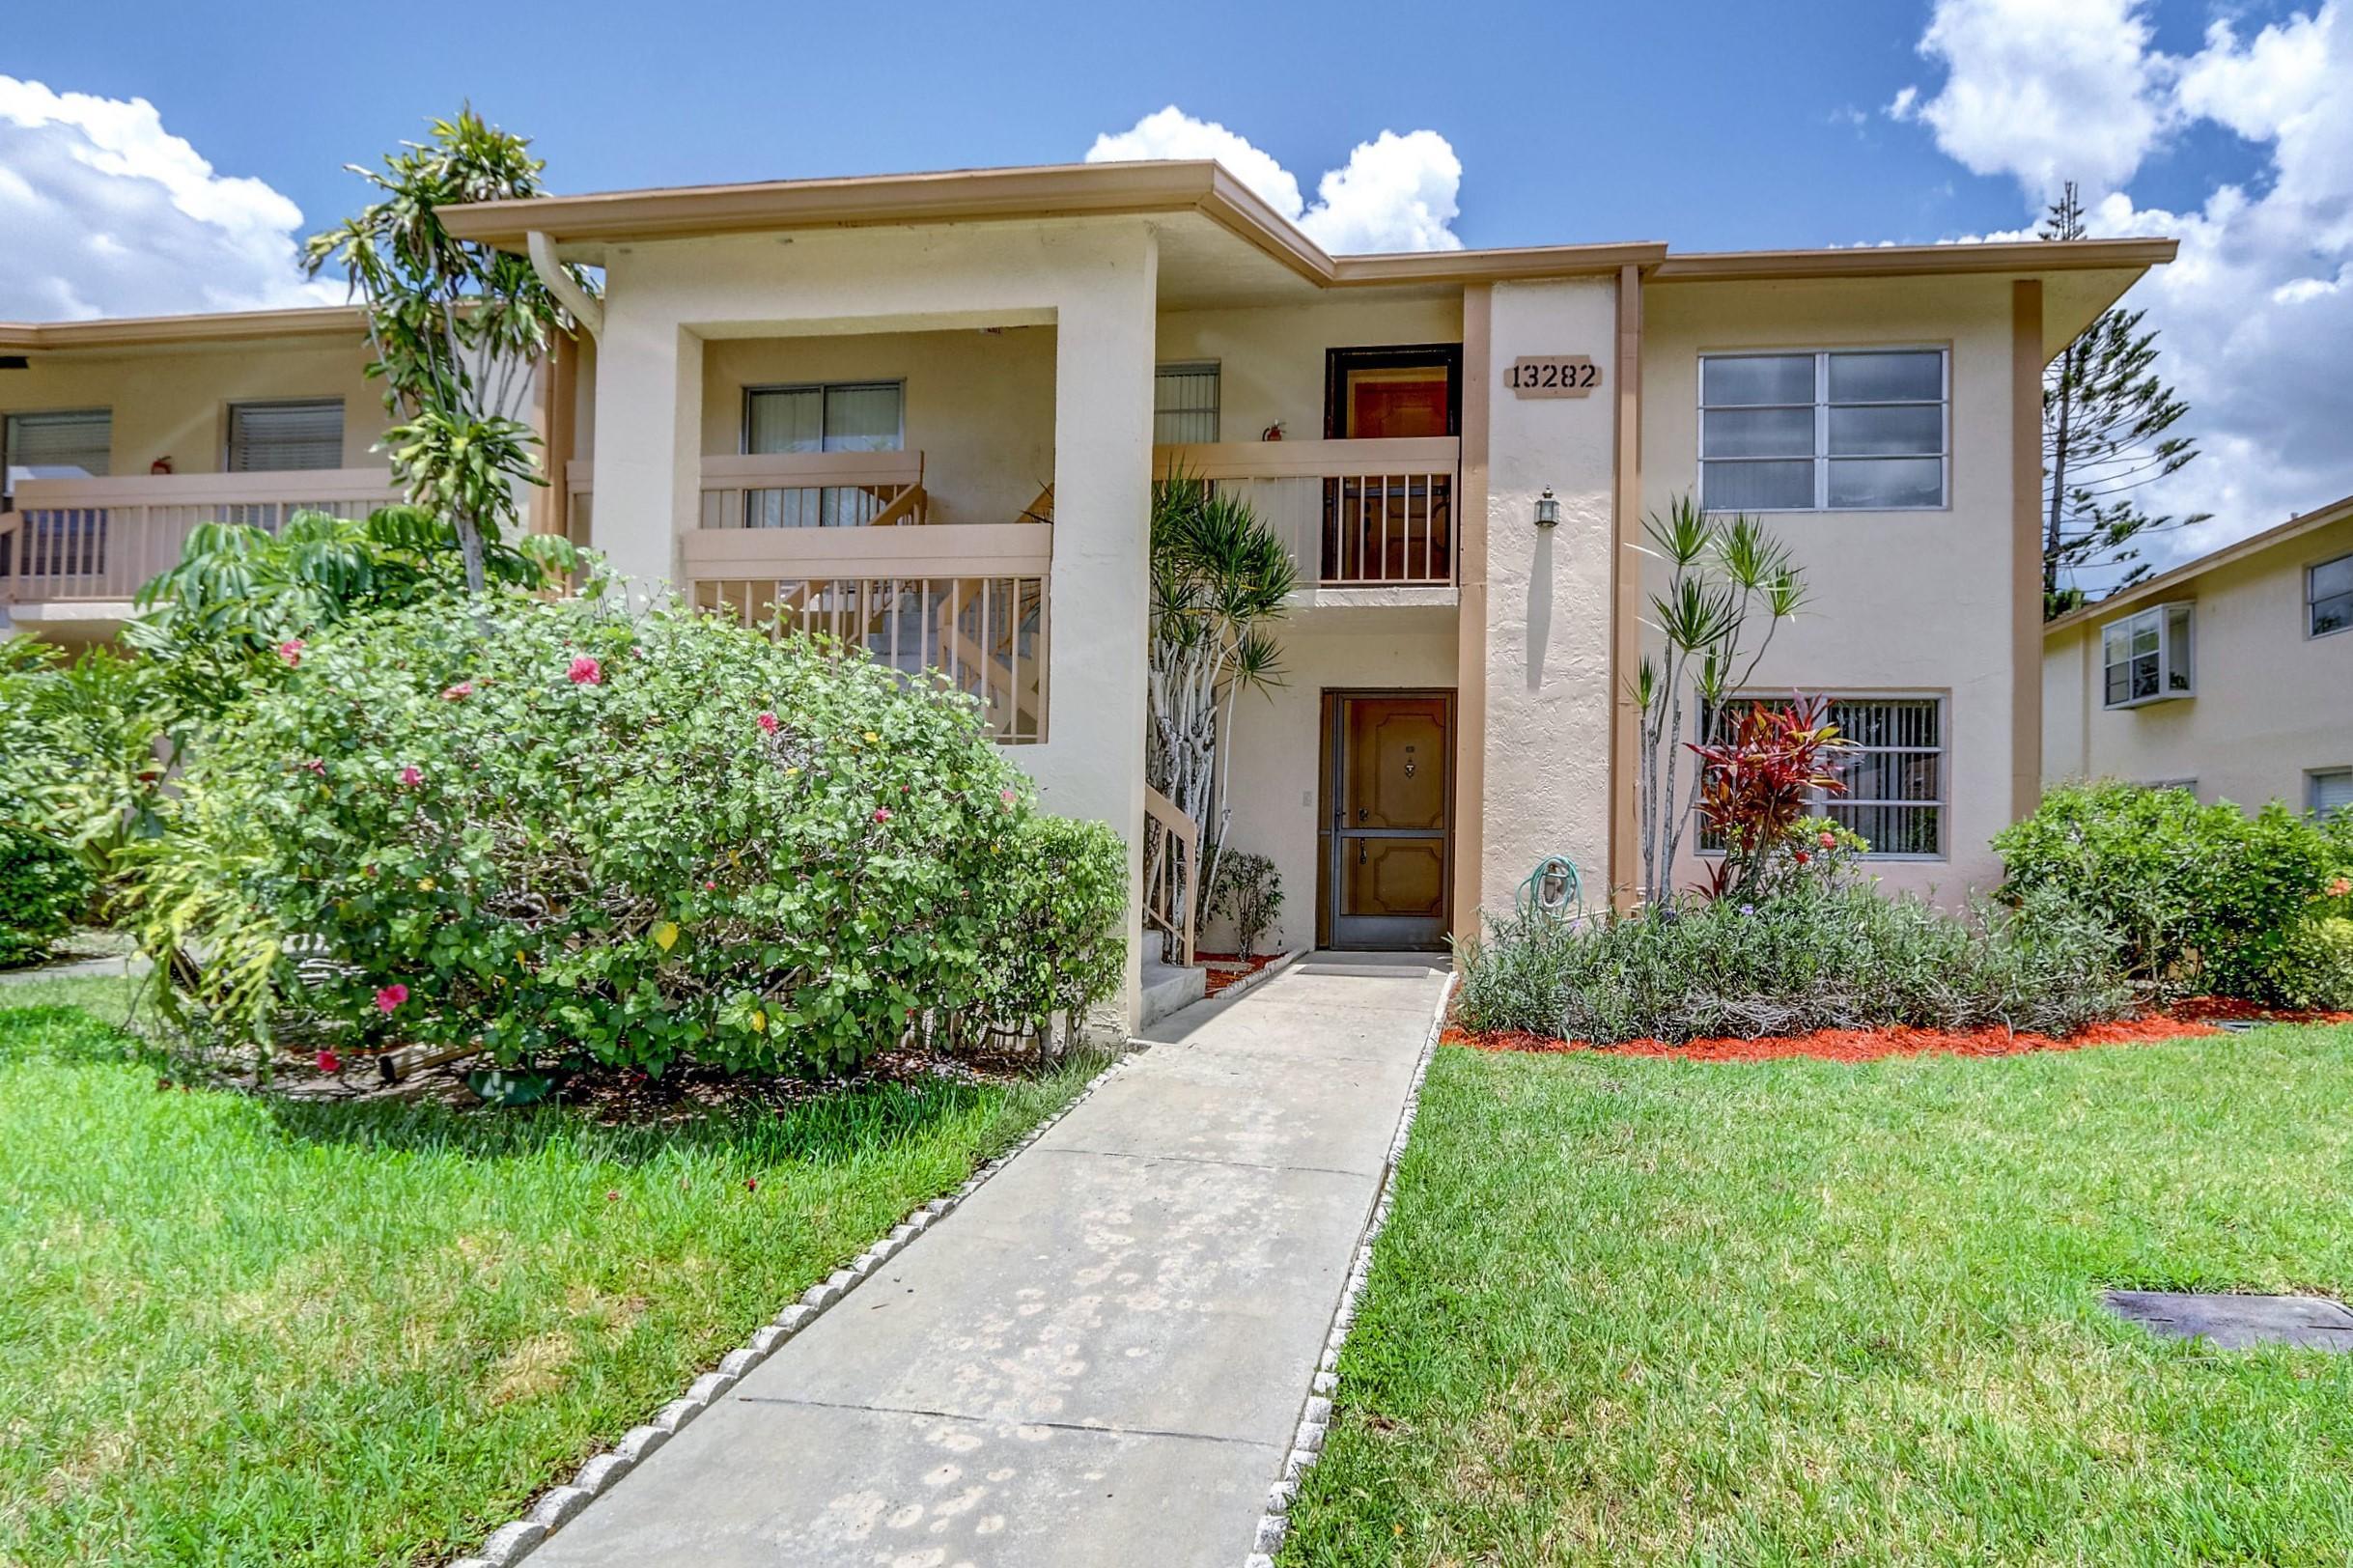 13282 Pineapple Palm Court Unit C  Delray Beach, FL 33484